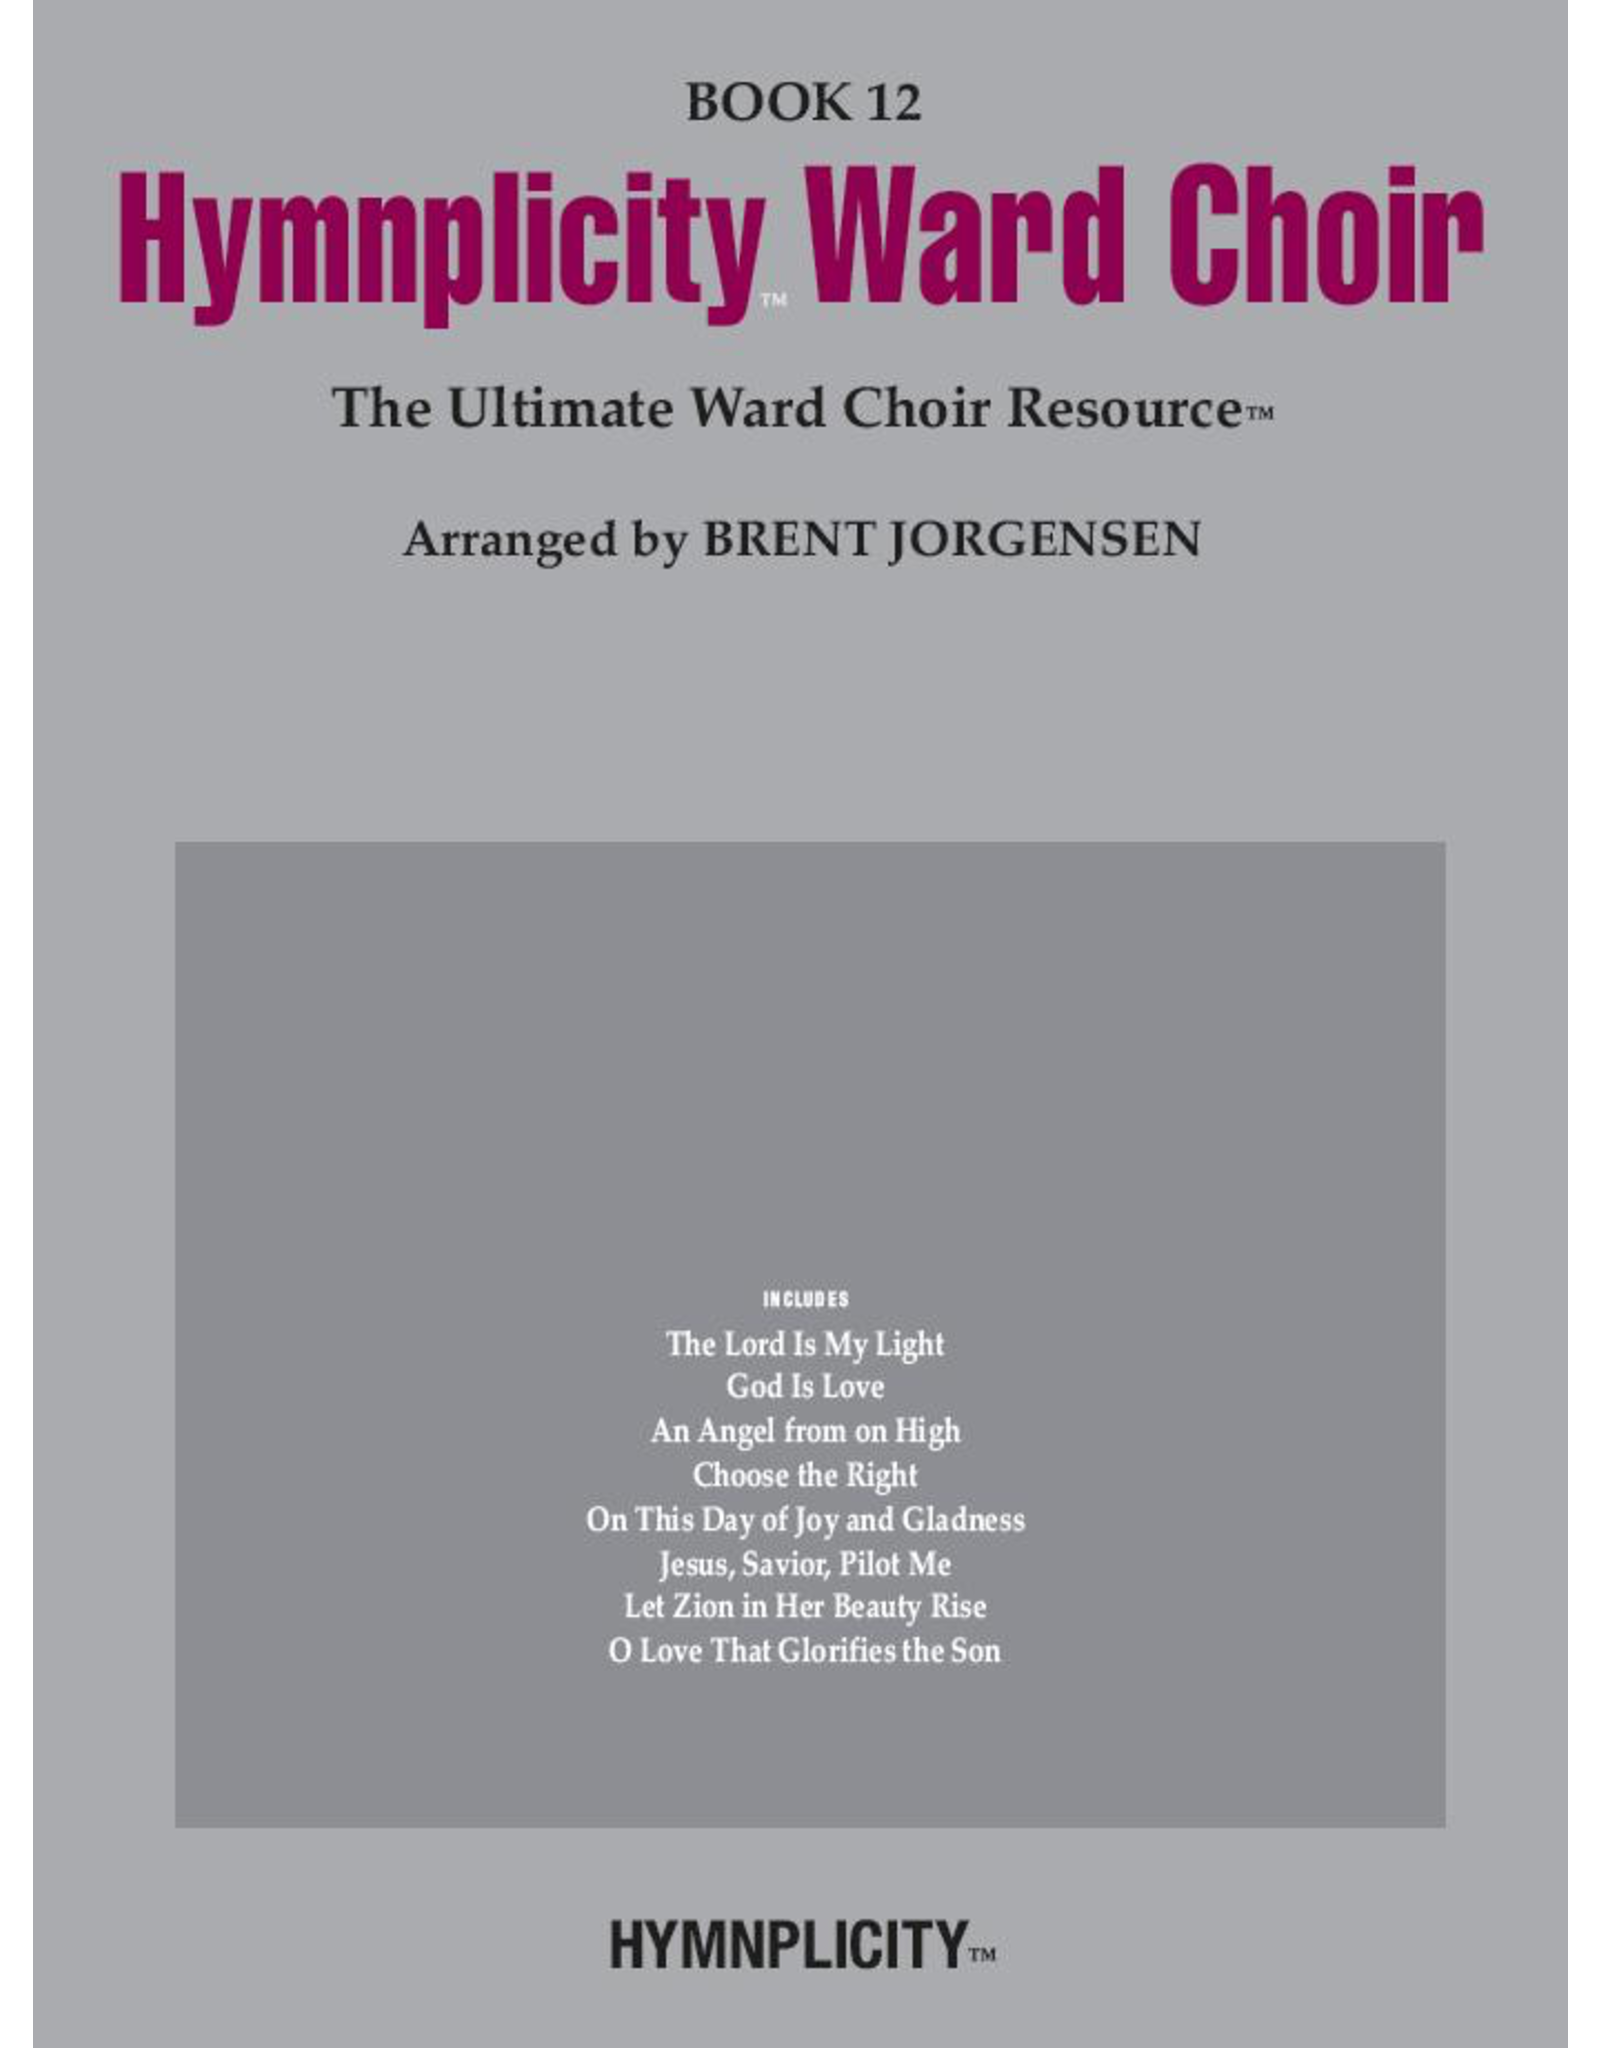 Jackman Music Hymnplicity Ward Choir Book 12